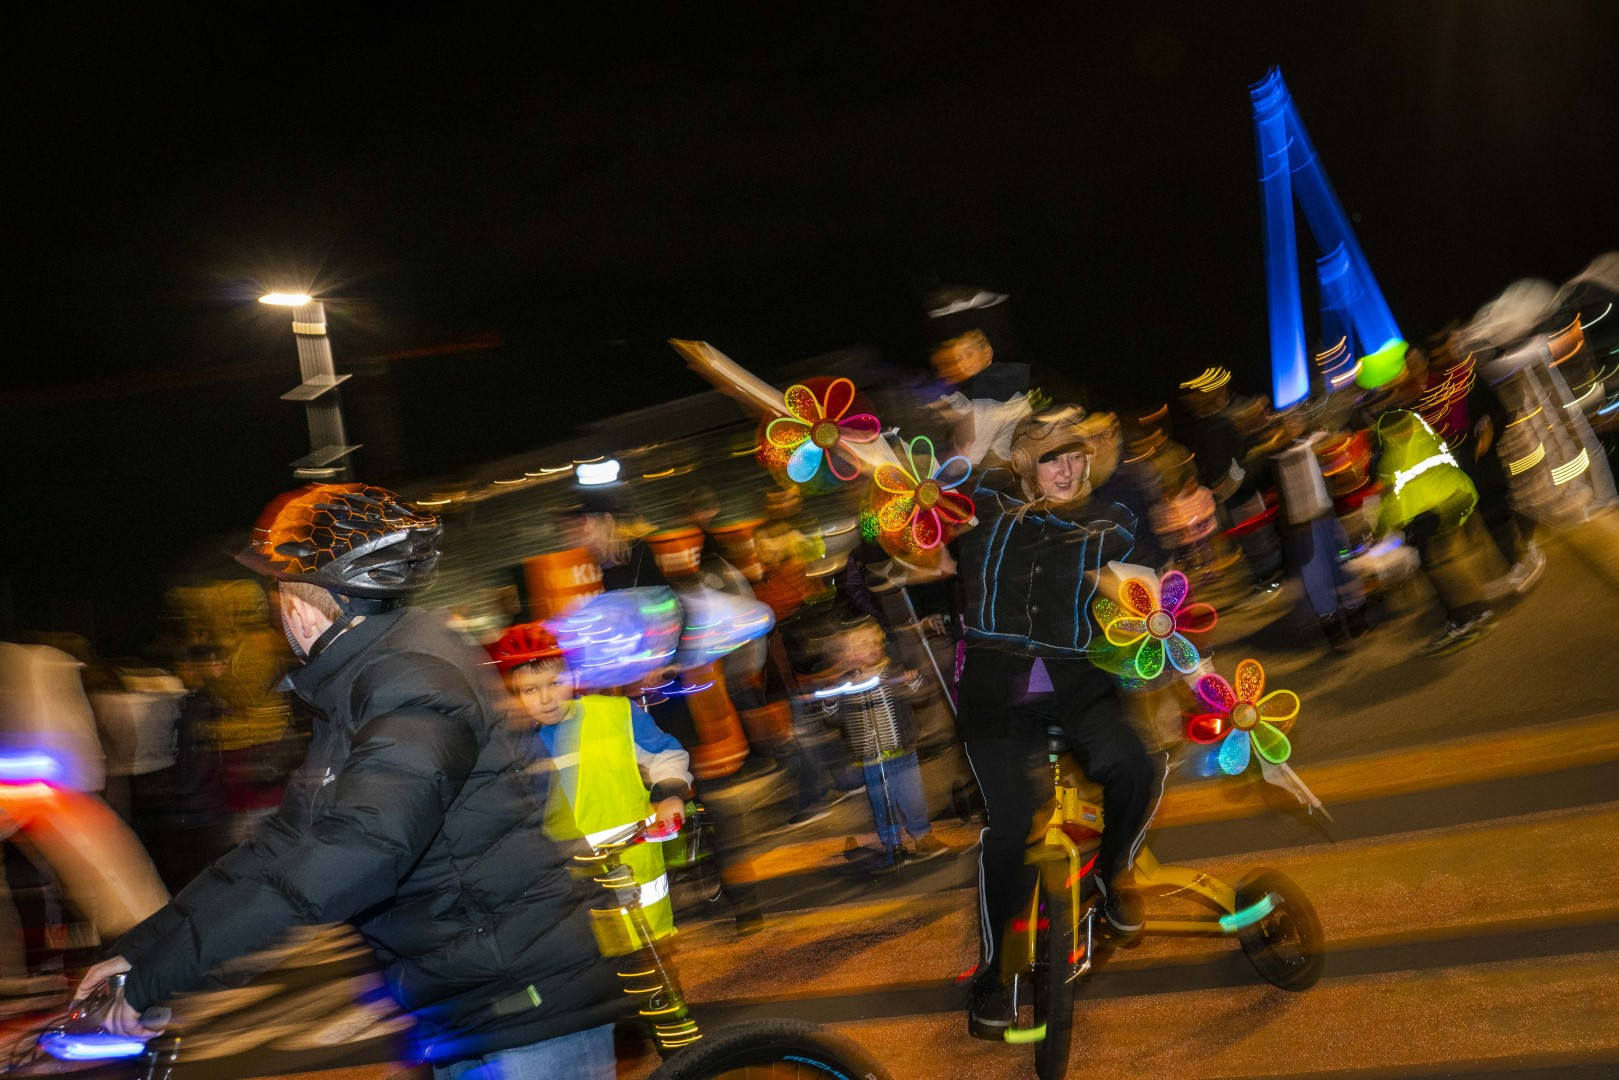 IMM Uni cycle blur 2.15MB photography John McDermott DSC03356 (Large).jpg